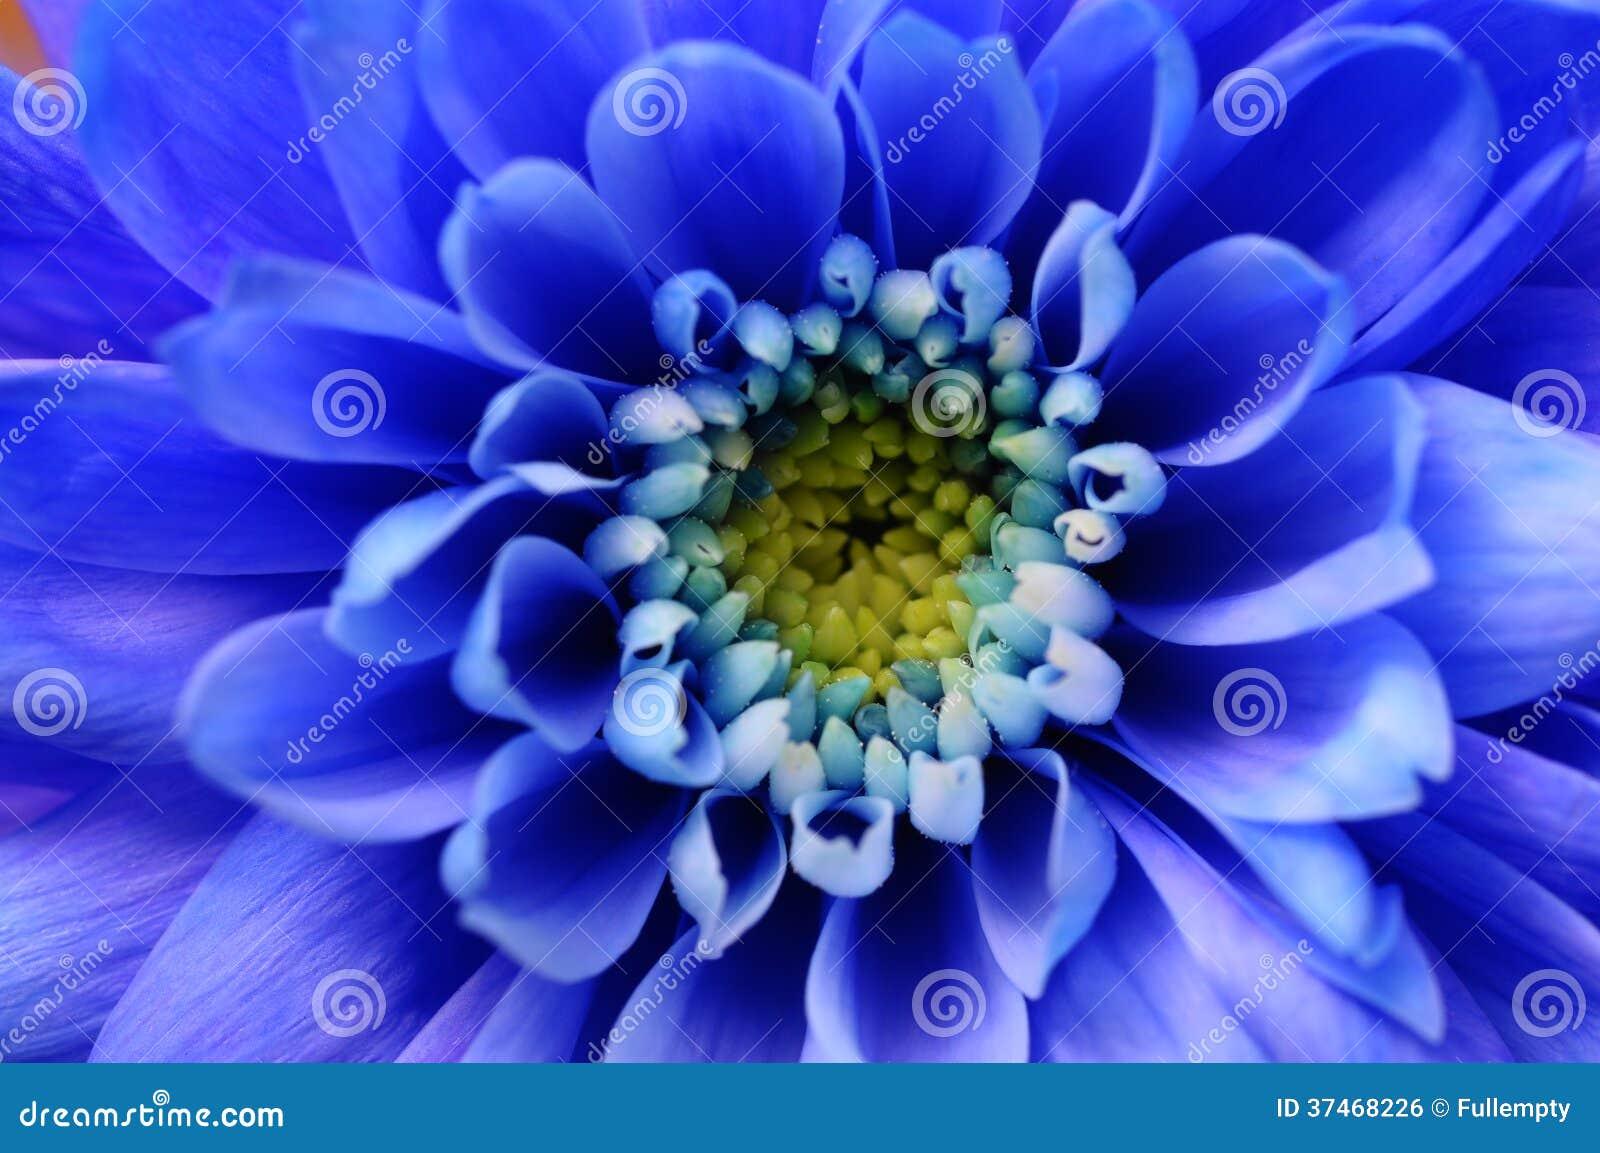 Macro Of Blue Aster Flower Stock Photo Image Of Wallpaper 37468226